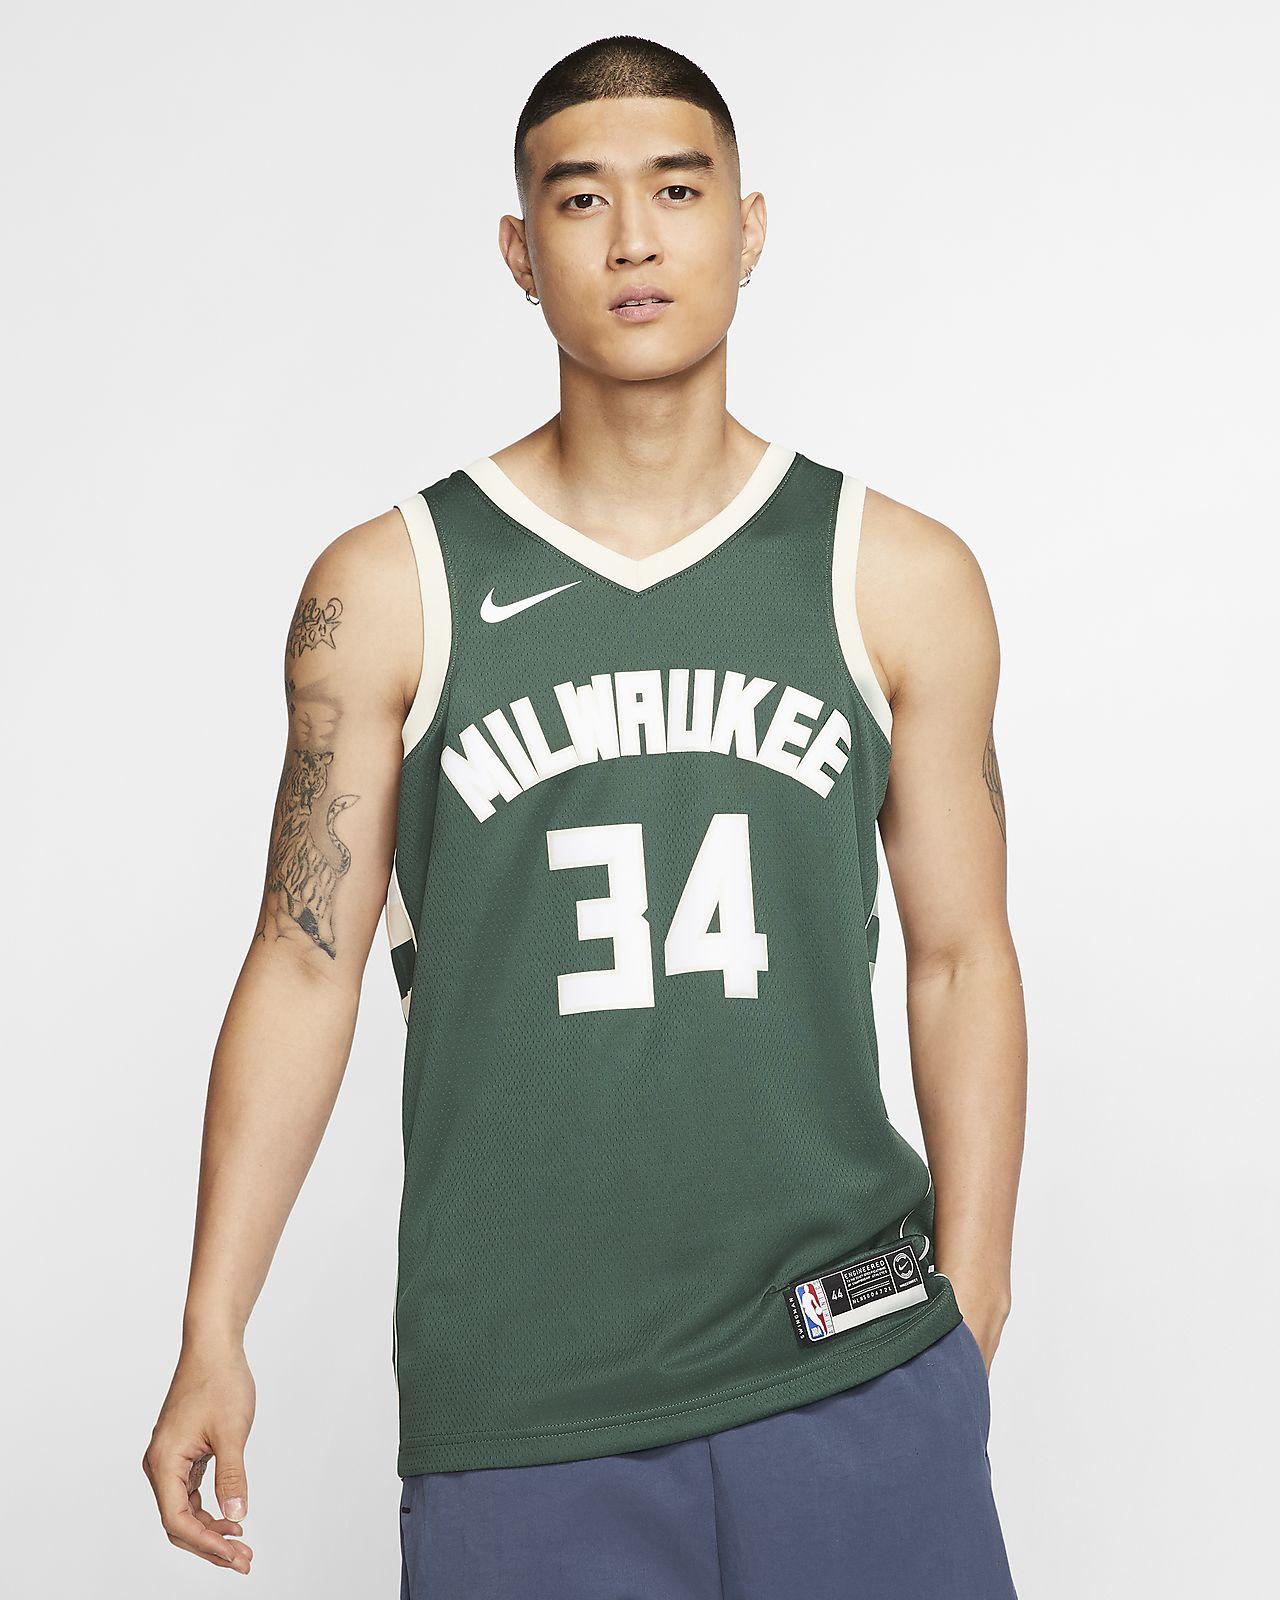 密尔沃基雄鹿队 (Giannis Antetokounmpo) Icon Edition Swingman Nike NBA Jersey 男子球衣